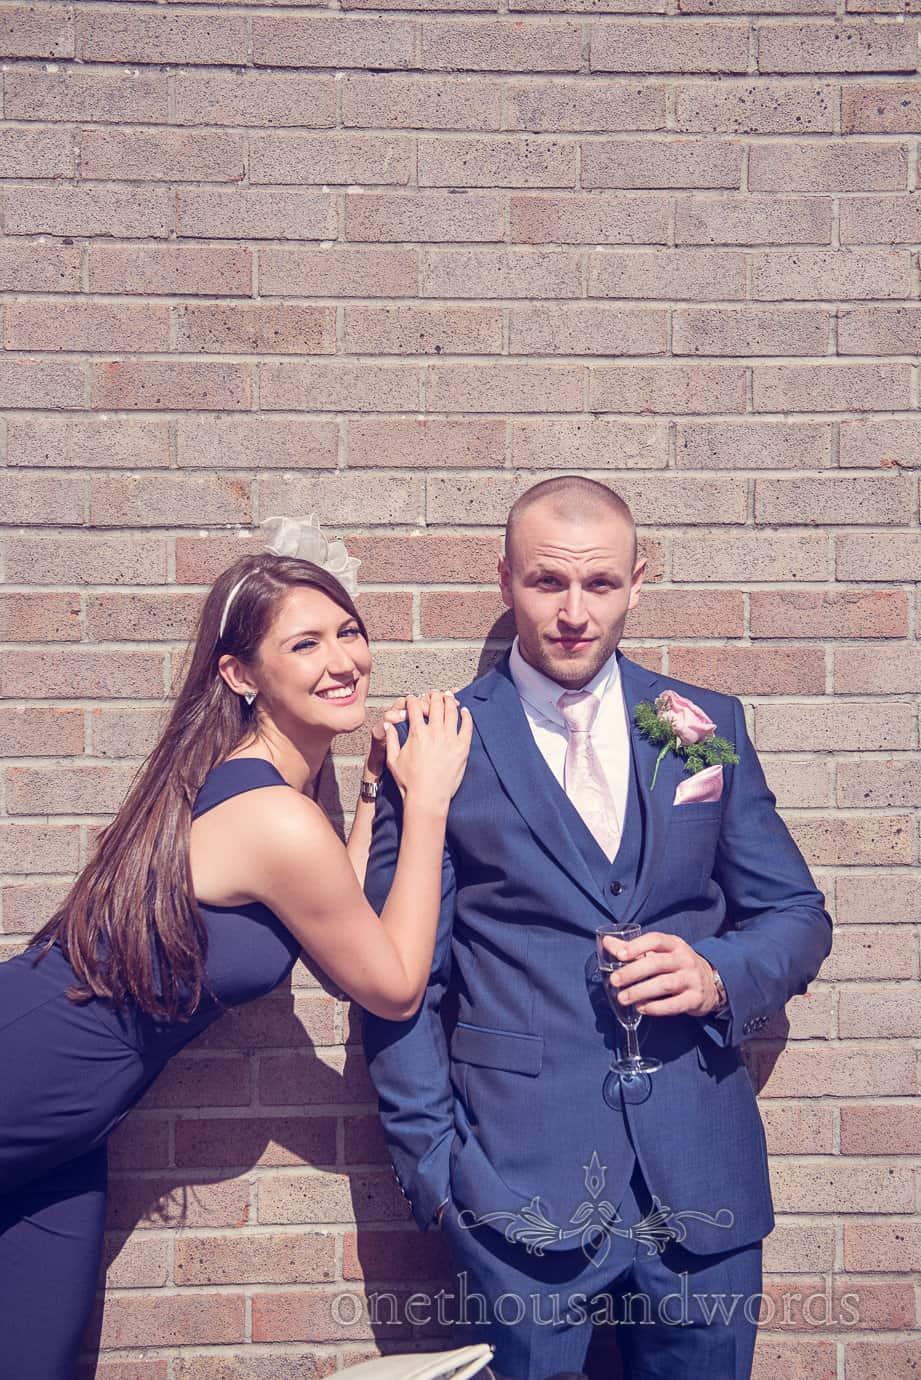 Wedding guests in blue against brick wall at Wareham Rugby Club wedding